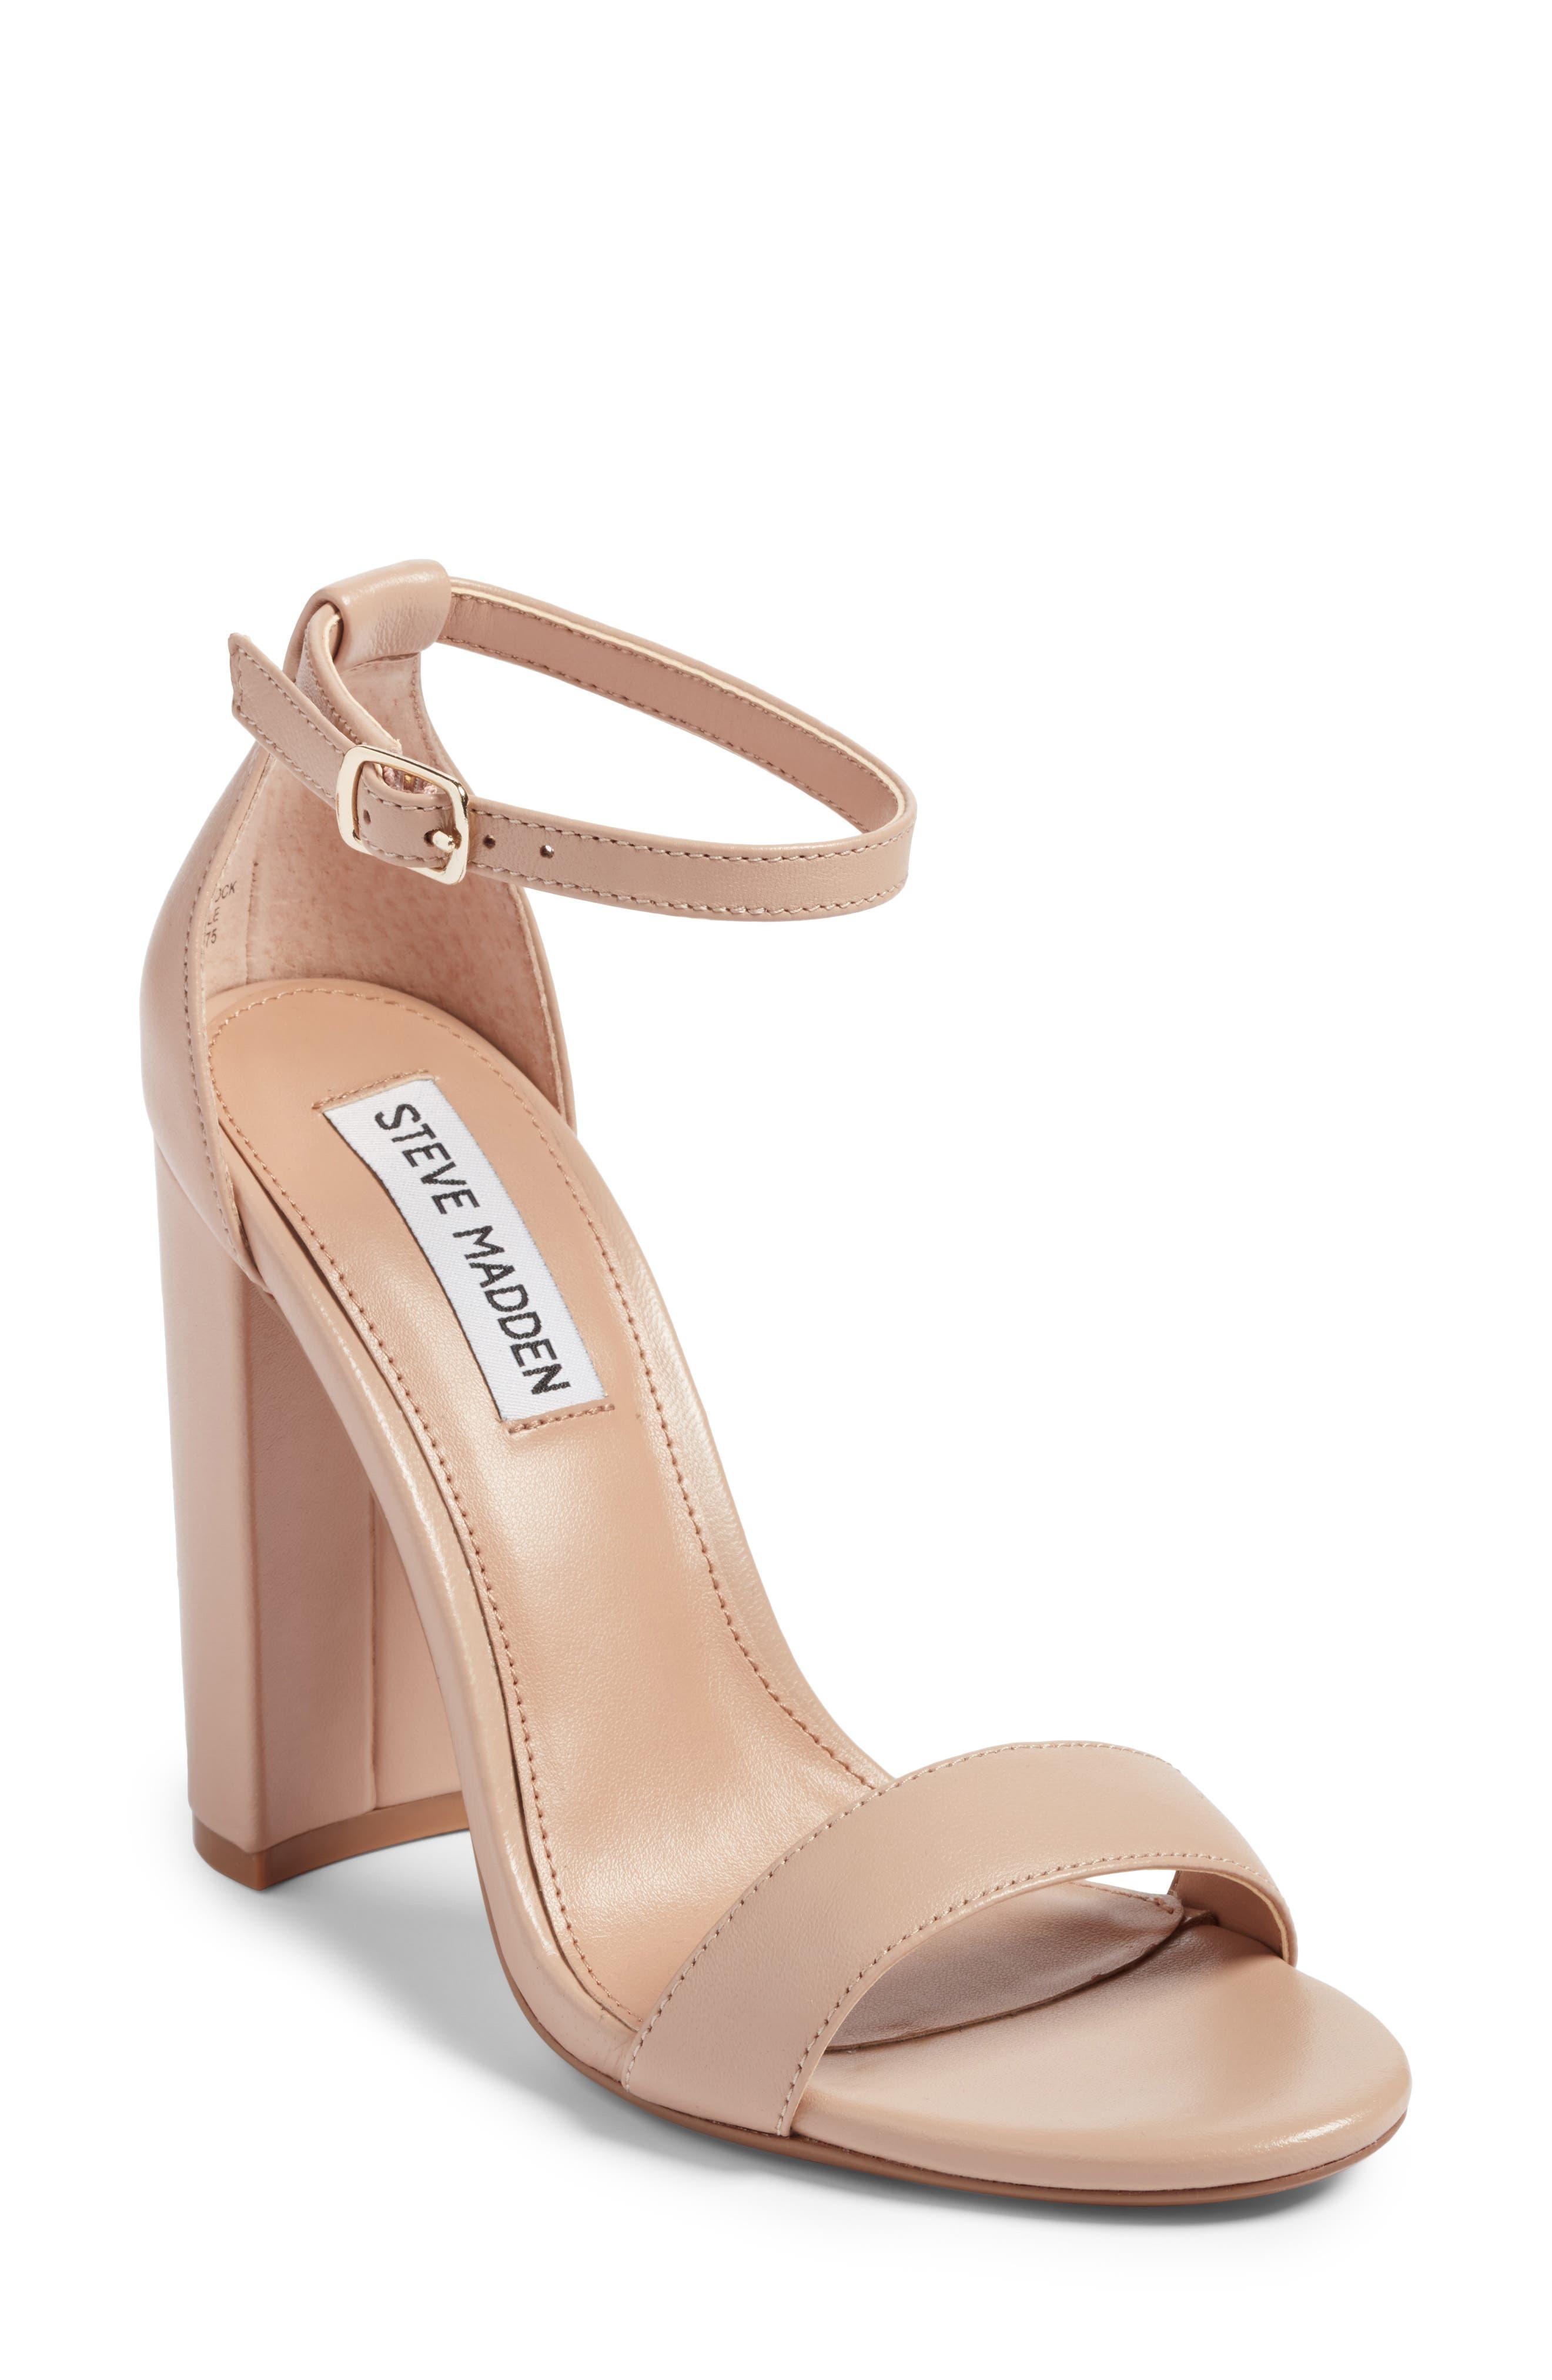 3841f48a6e3b Steve madden carrson sandal women nordstrom jpeg 780x838 Steve madden  carrson sandal